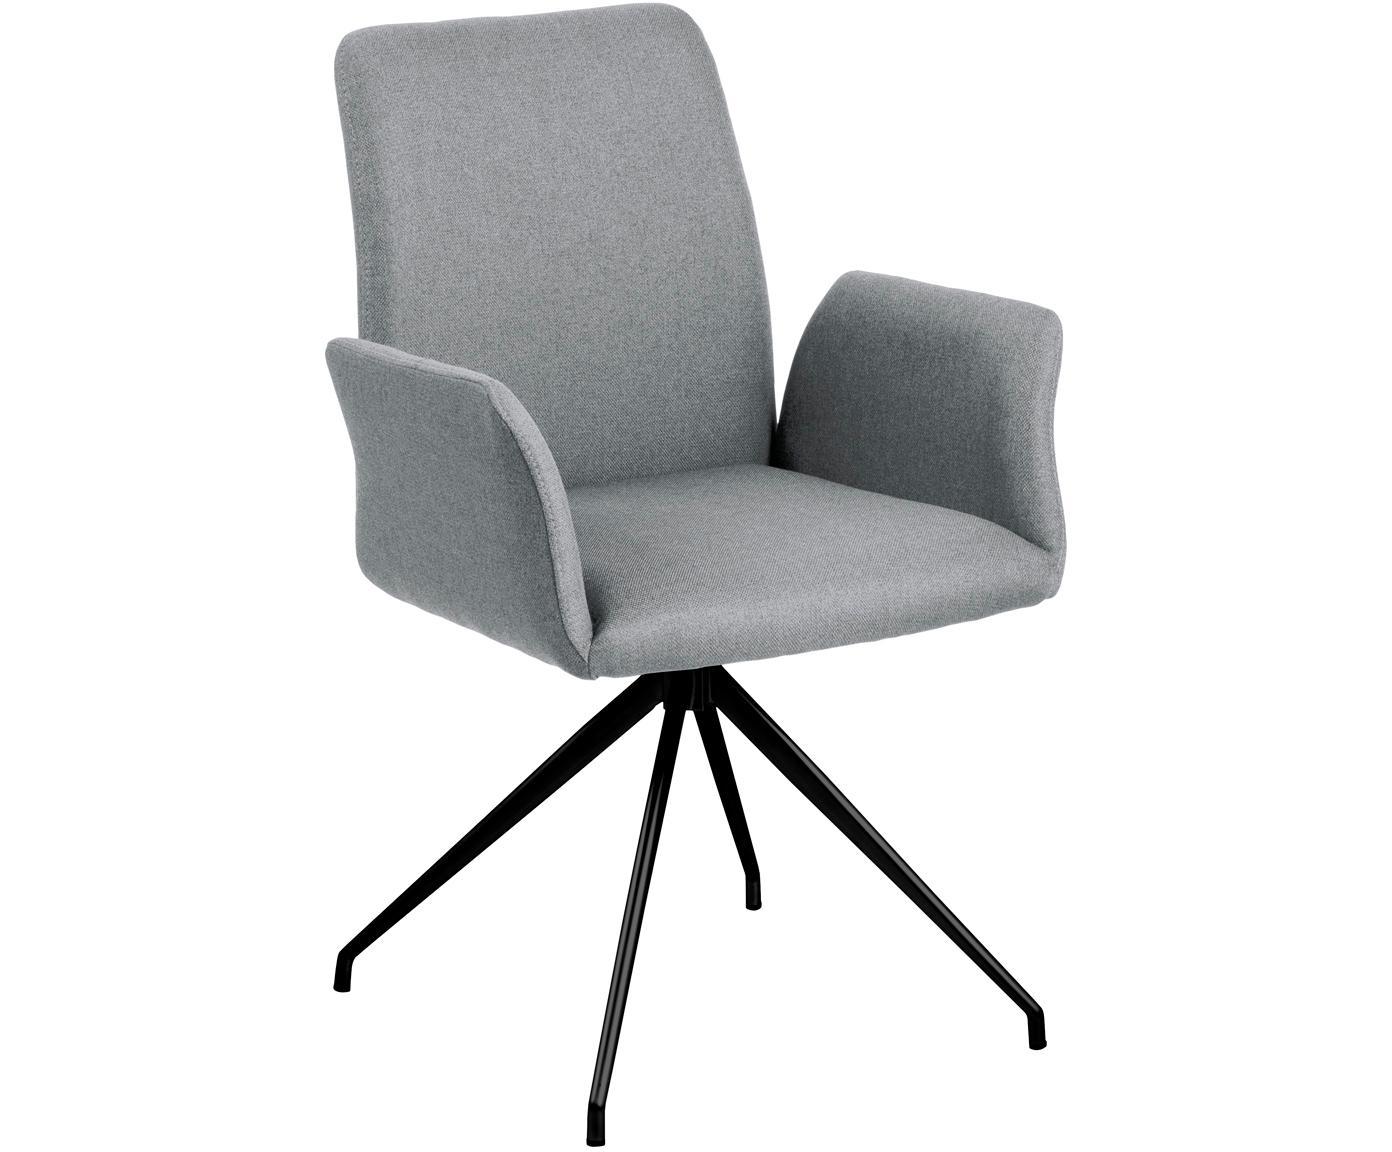 Drehstuhl Naya in Grau, Bezug: Polyester 25.000 Scheuert, Gestell: Metall, pulverbeschichtet, Webstoff Hellgrau, B 59 x T 59 cm